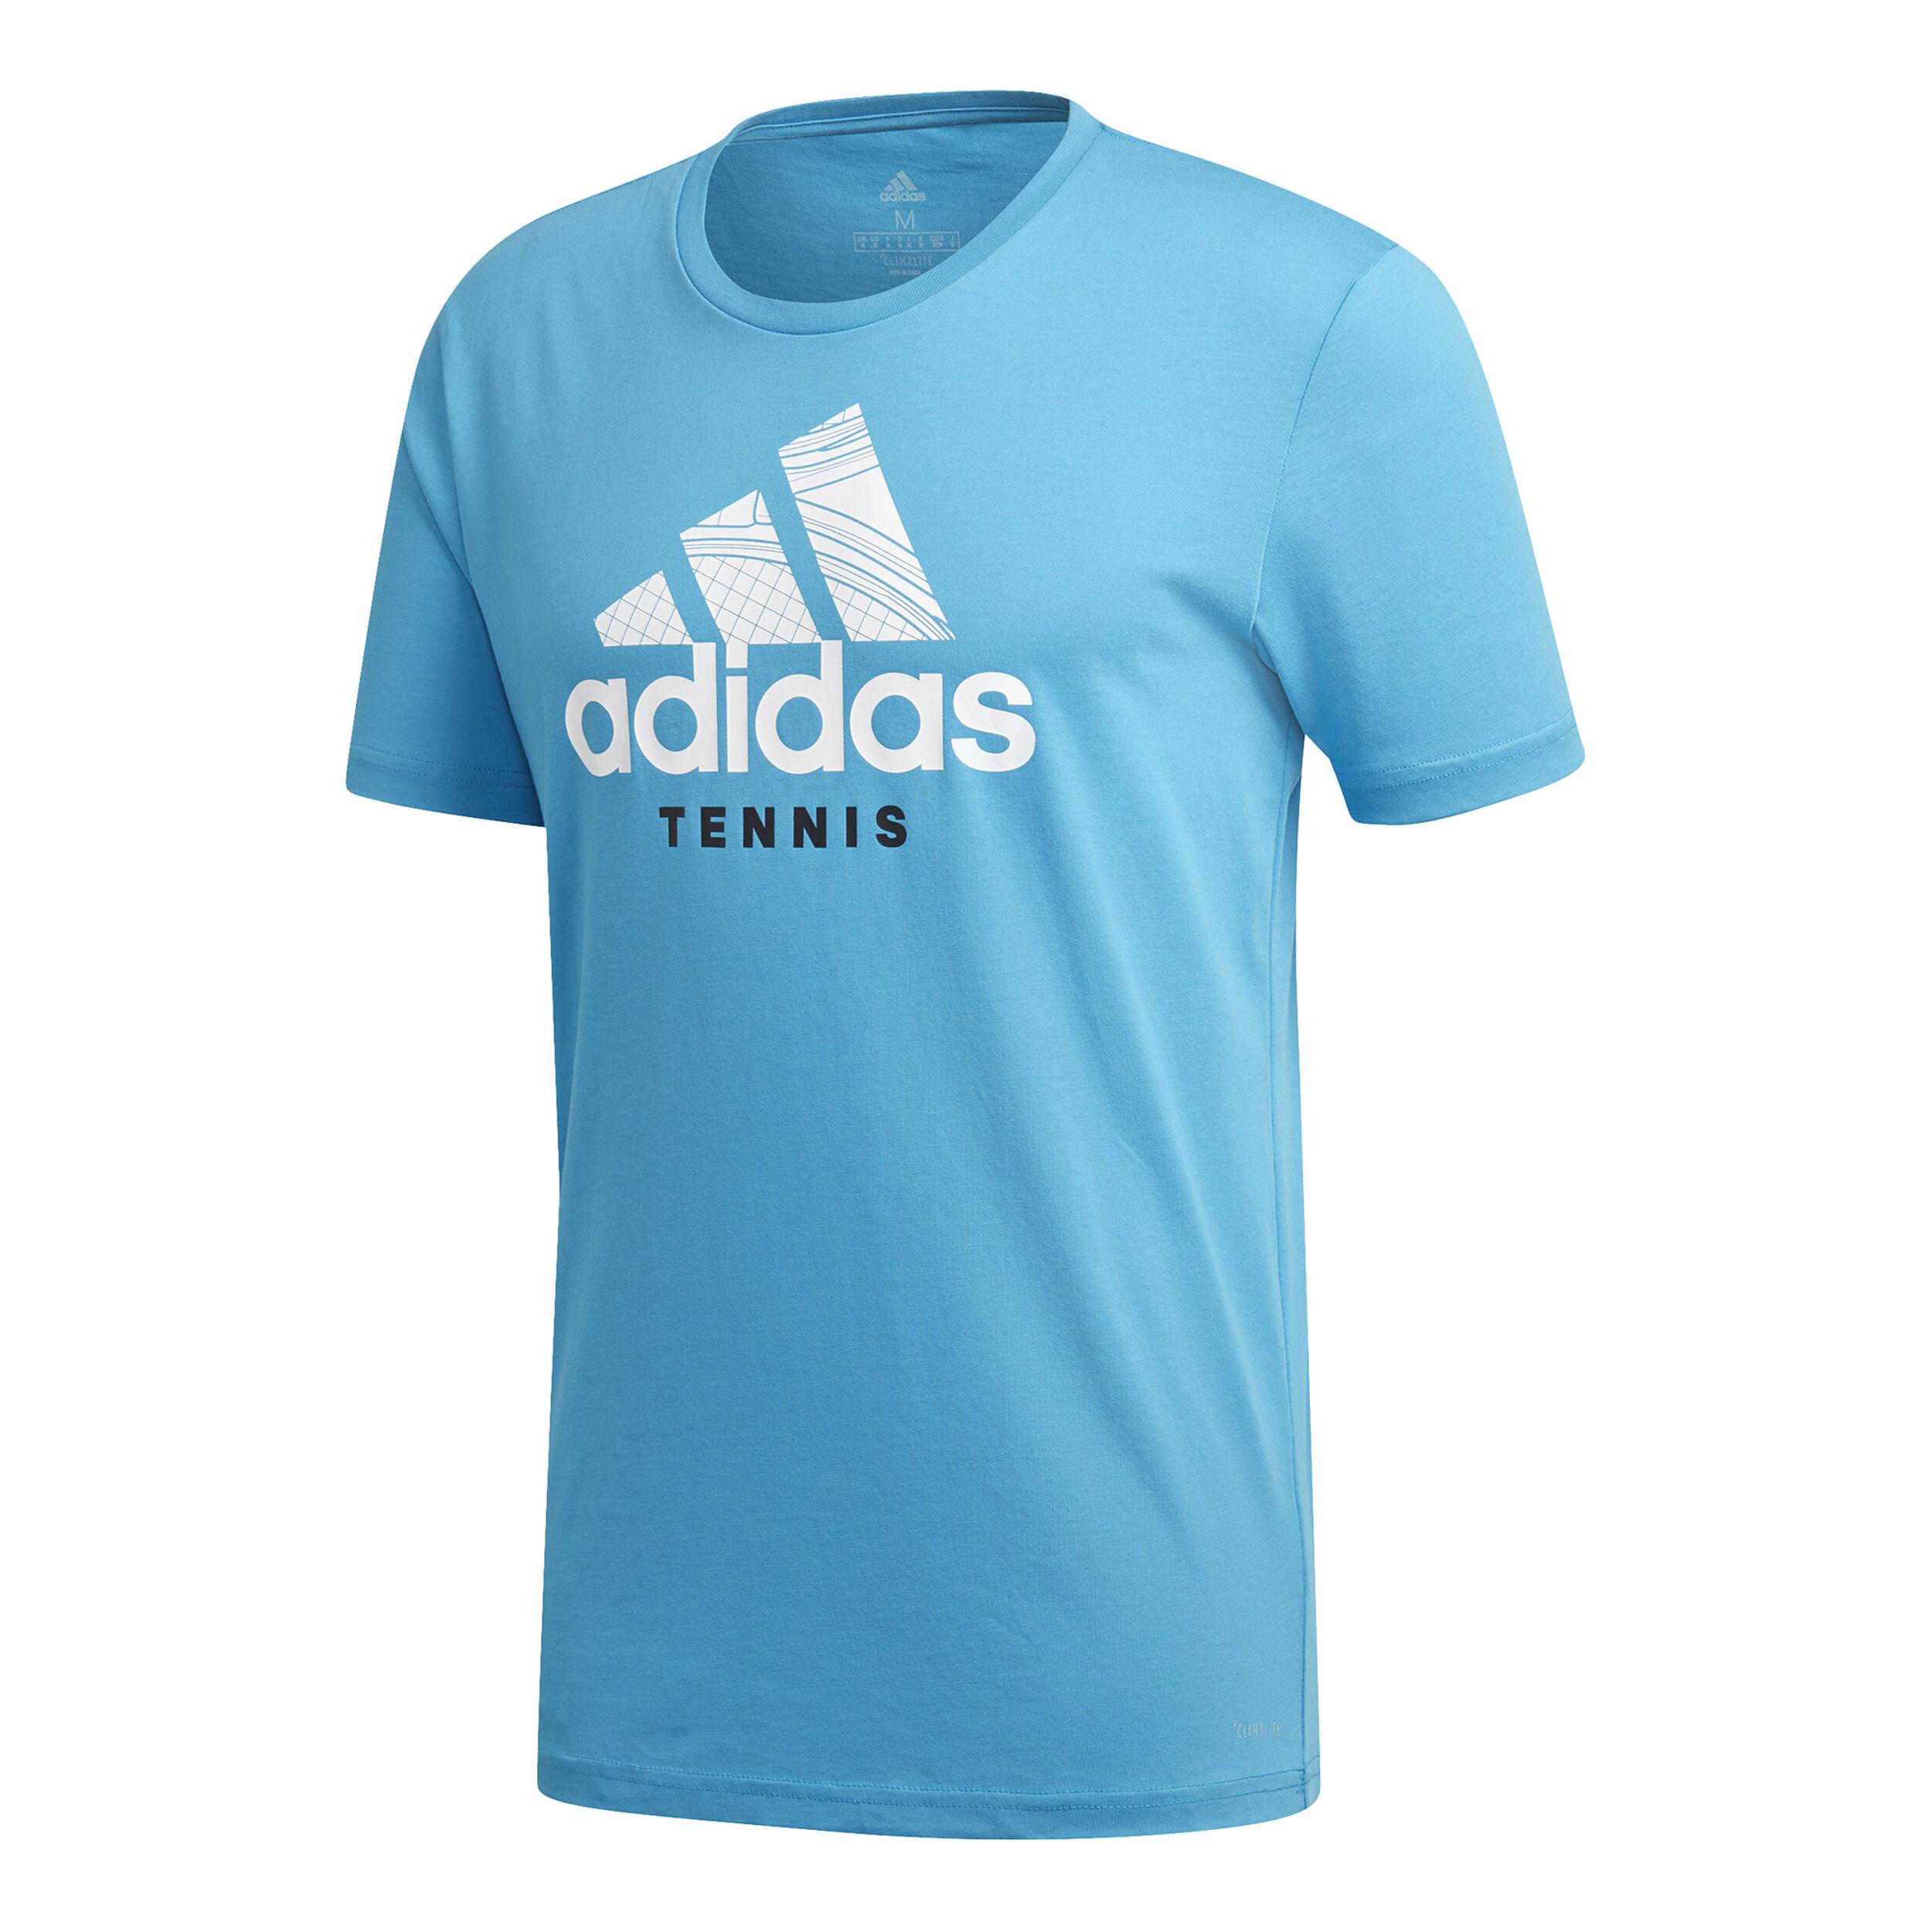 adidas Category Graphic T Shirt Herren Hellblau, Weiß